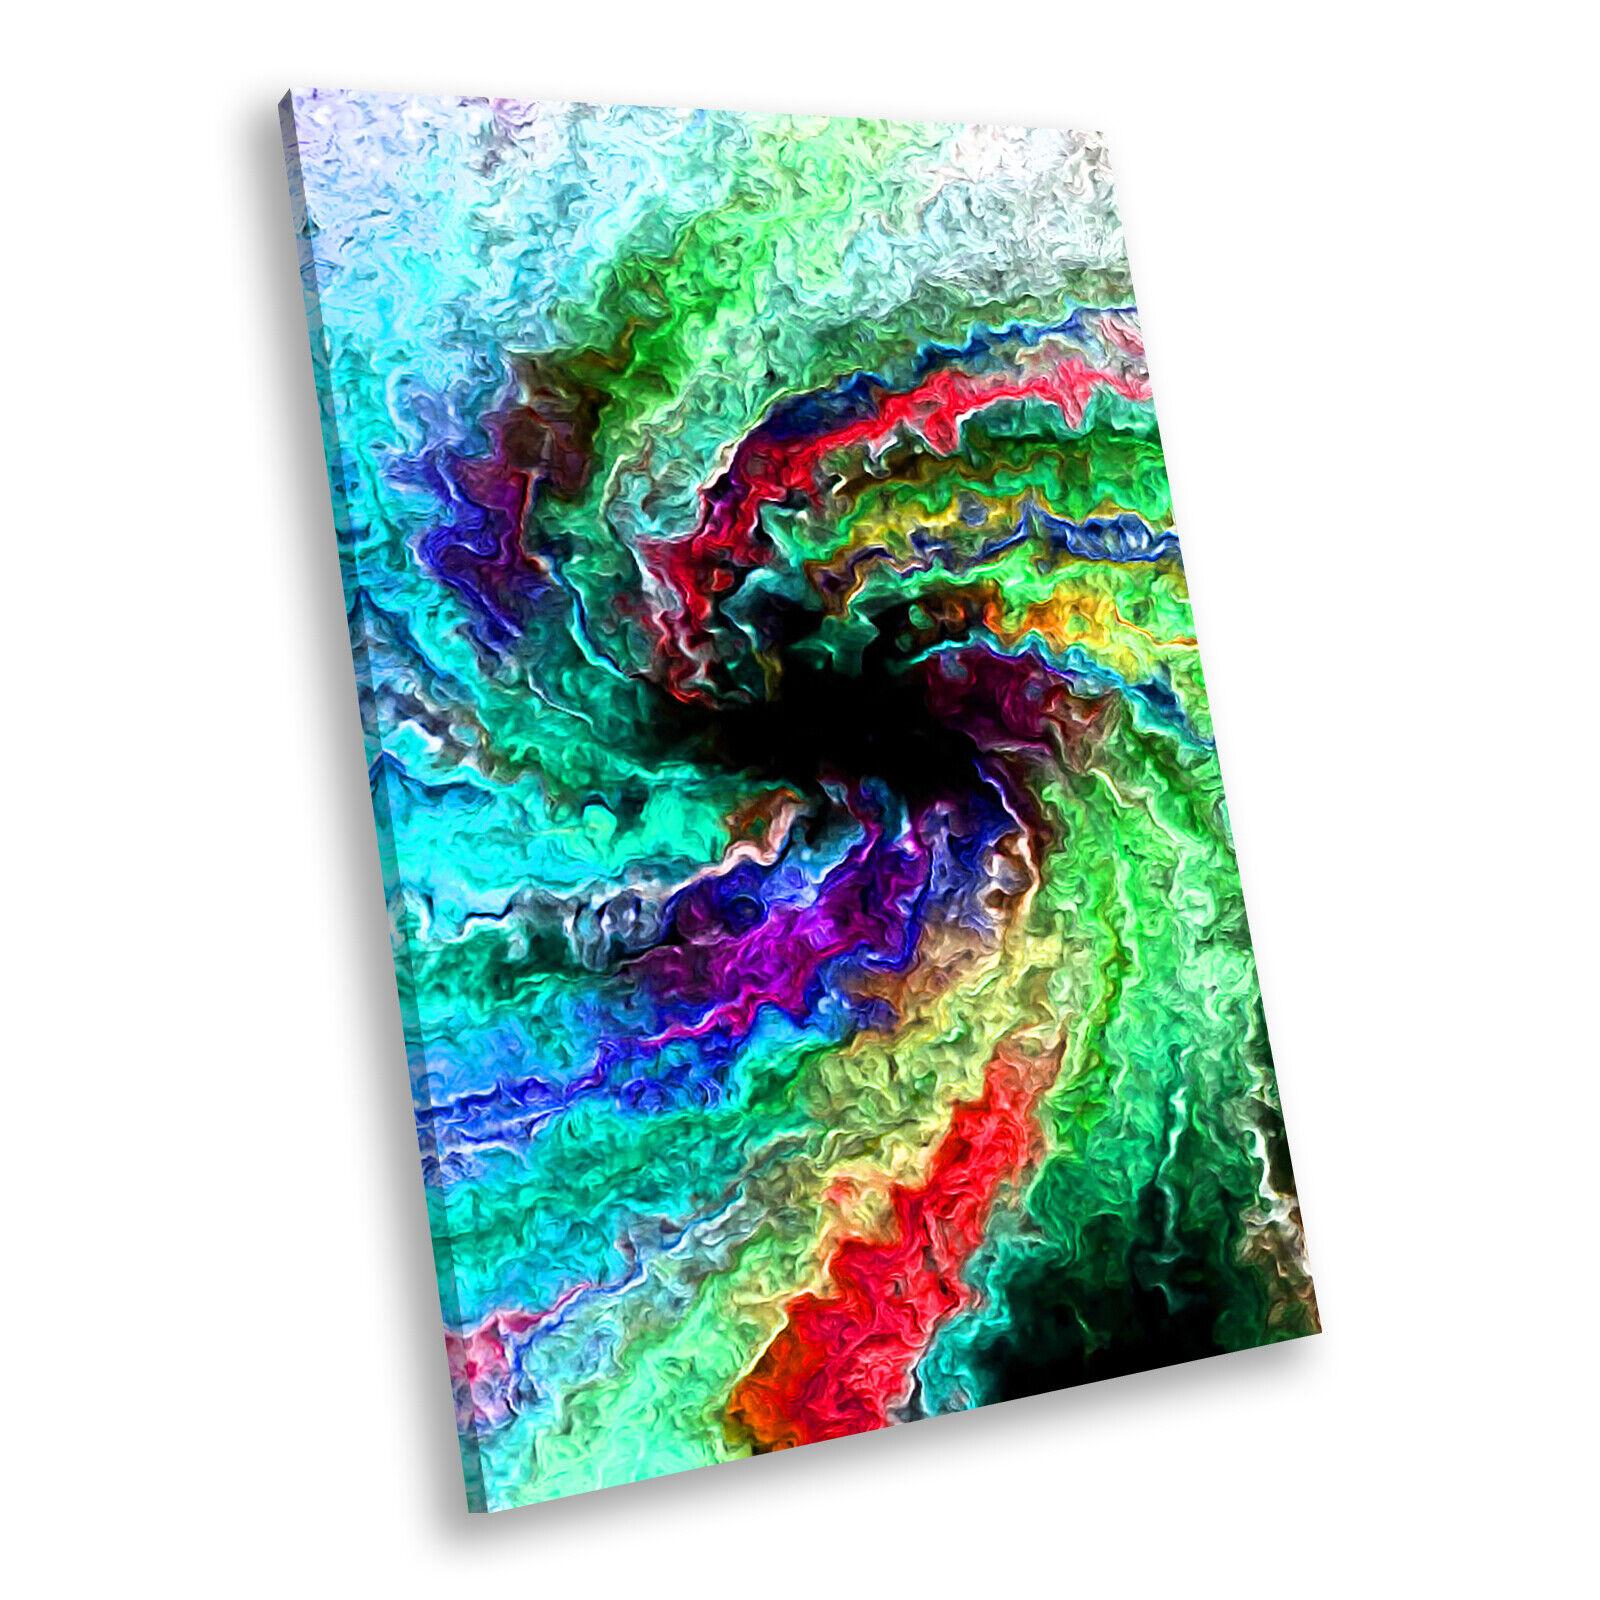 Grün Blau Colourful  Portrait Abstract Canvas Wall Art Large Picture Prints